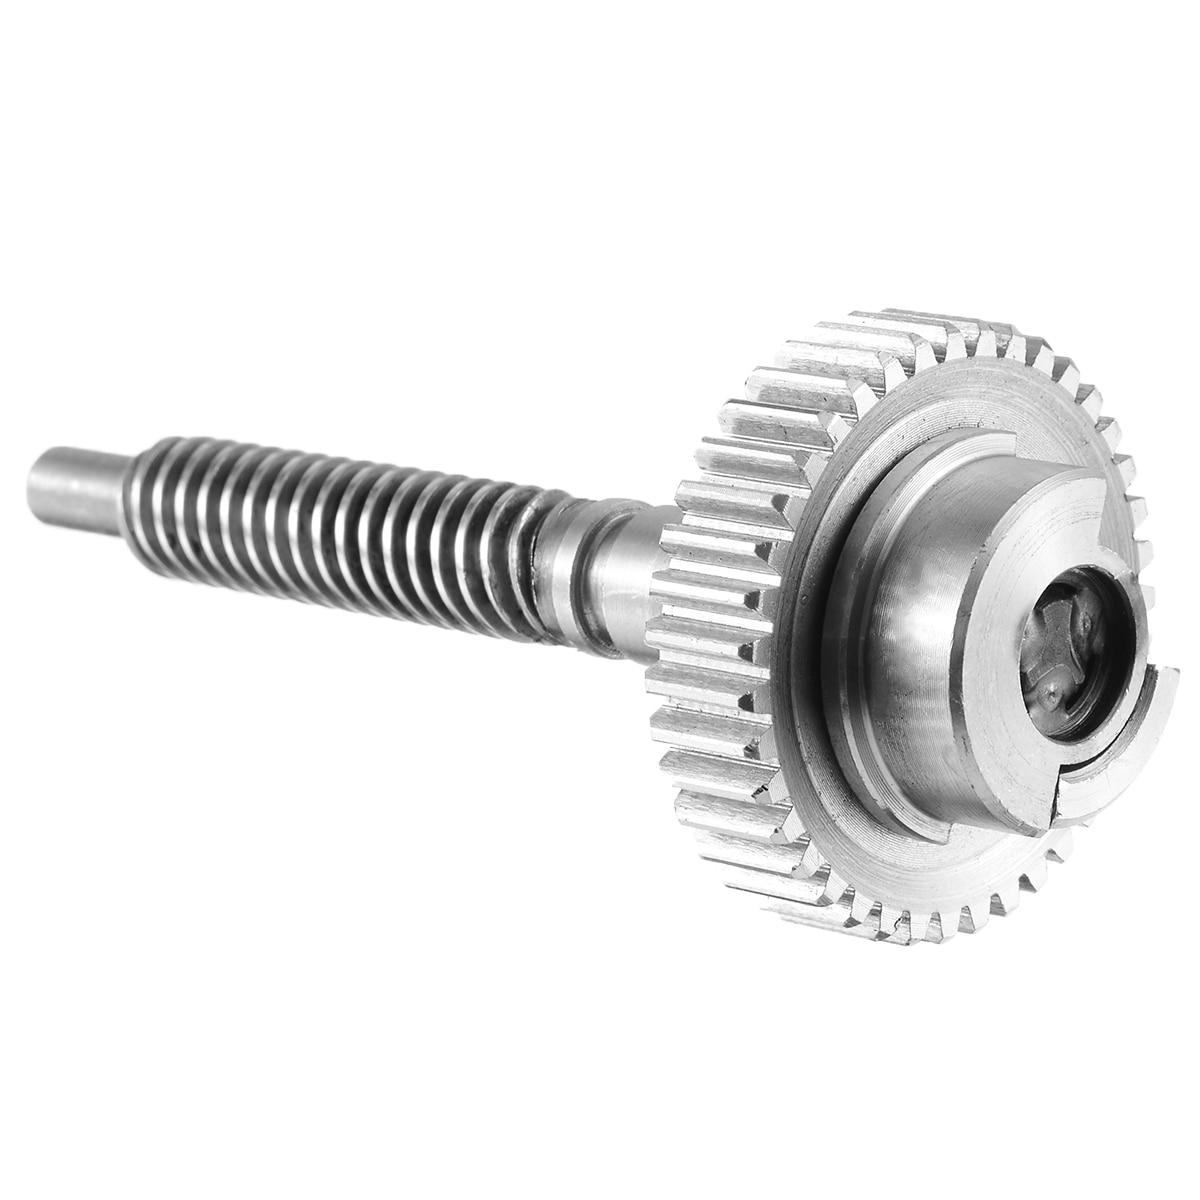 Metal Parking Brake 39 Gear Actuator Repair Kit Car Handbrake Tools For BMW E65 E66 745i 750i 760i